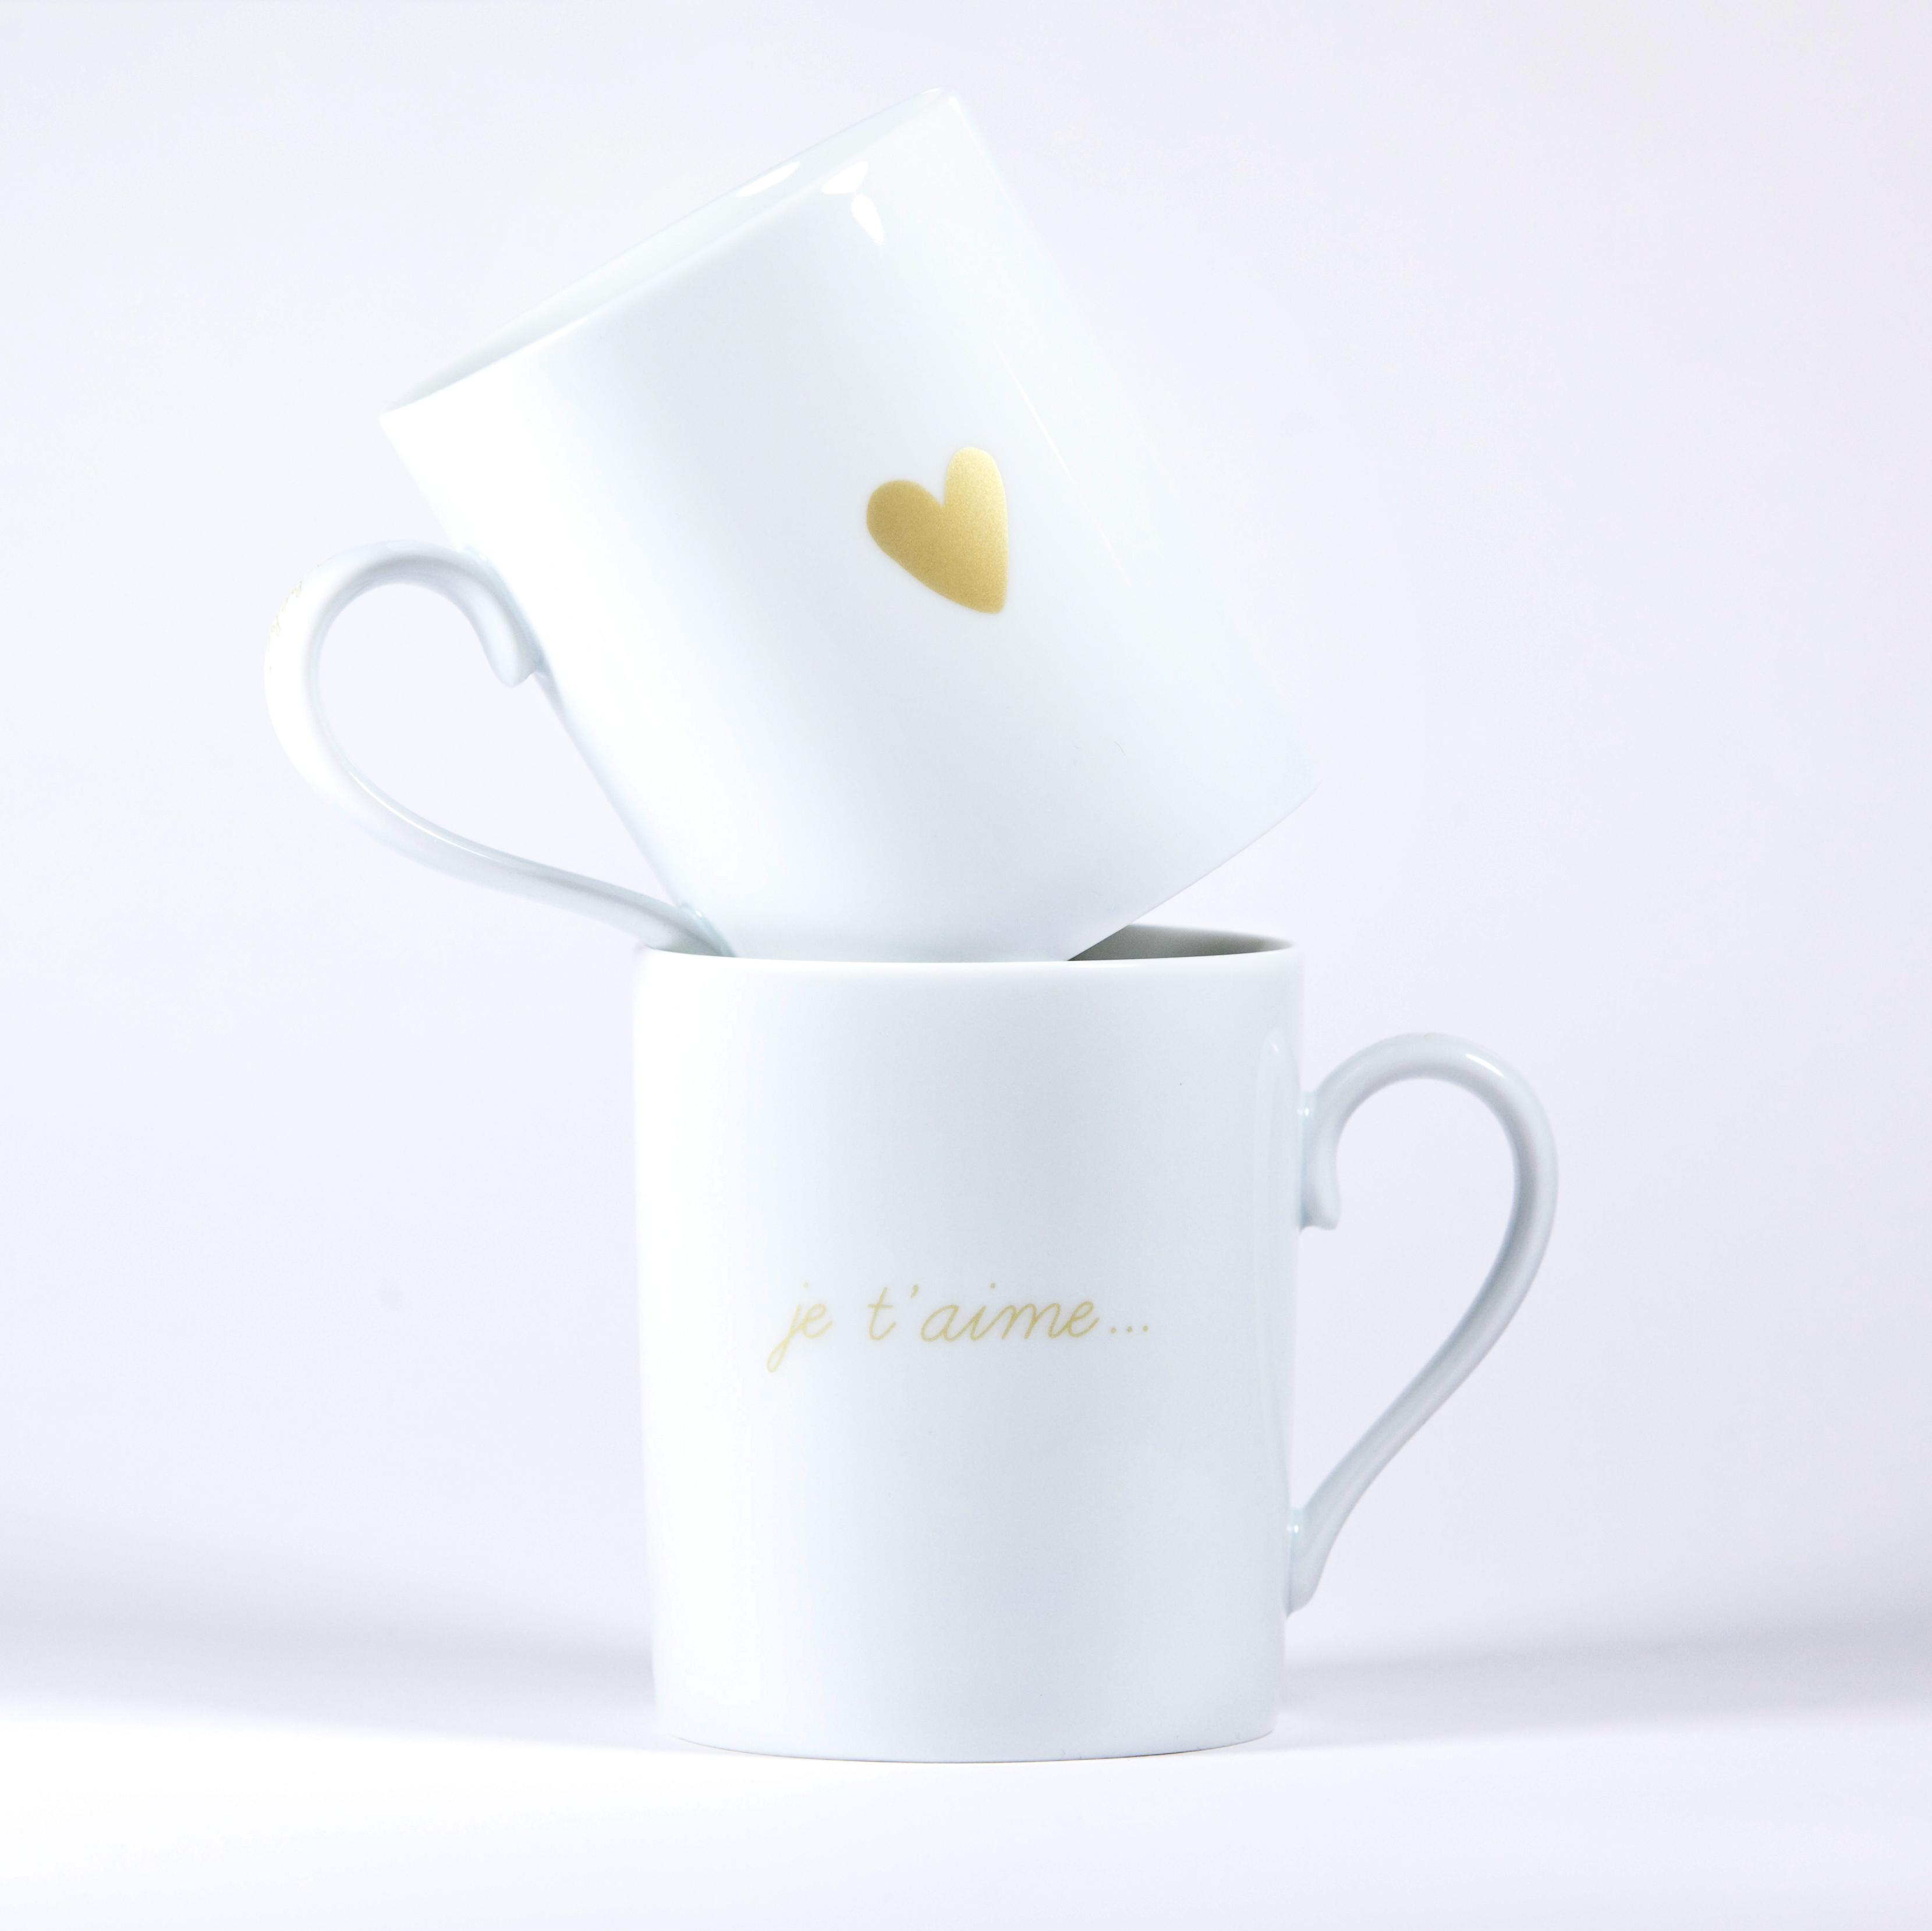 Le mug je t'aime